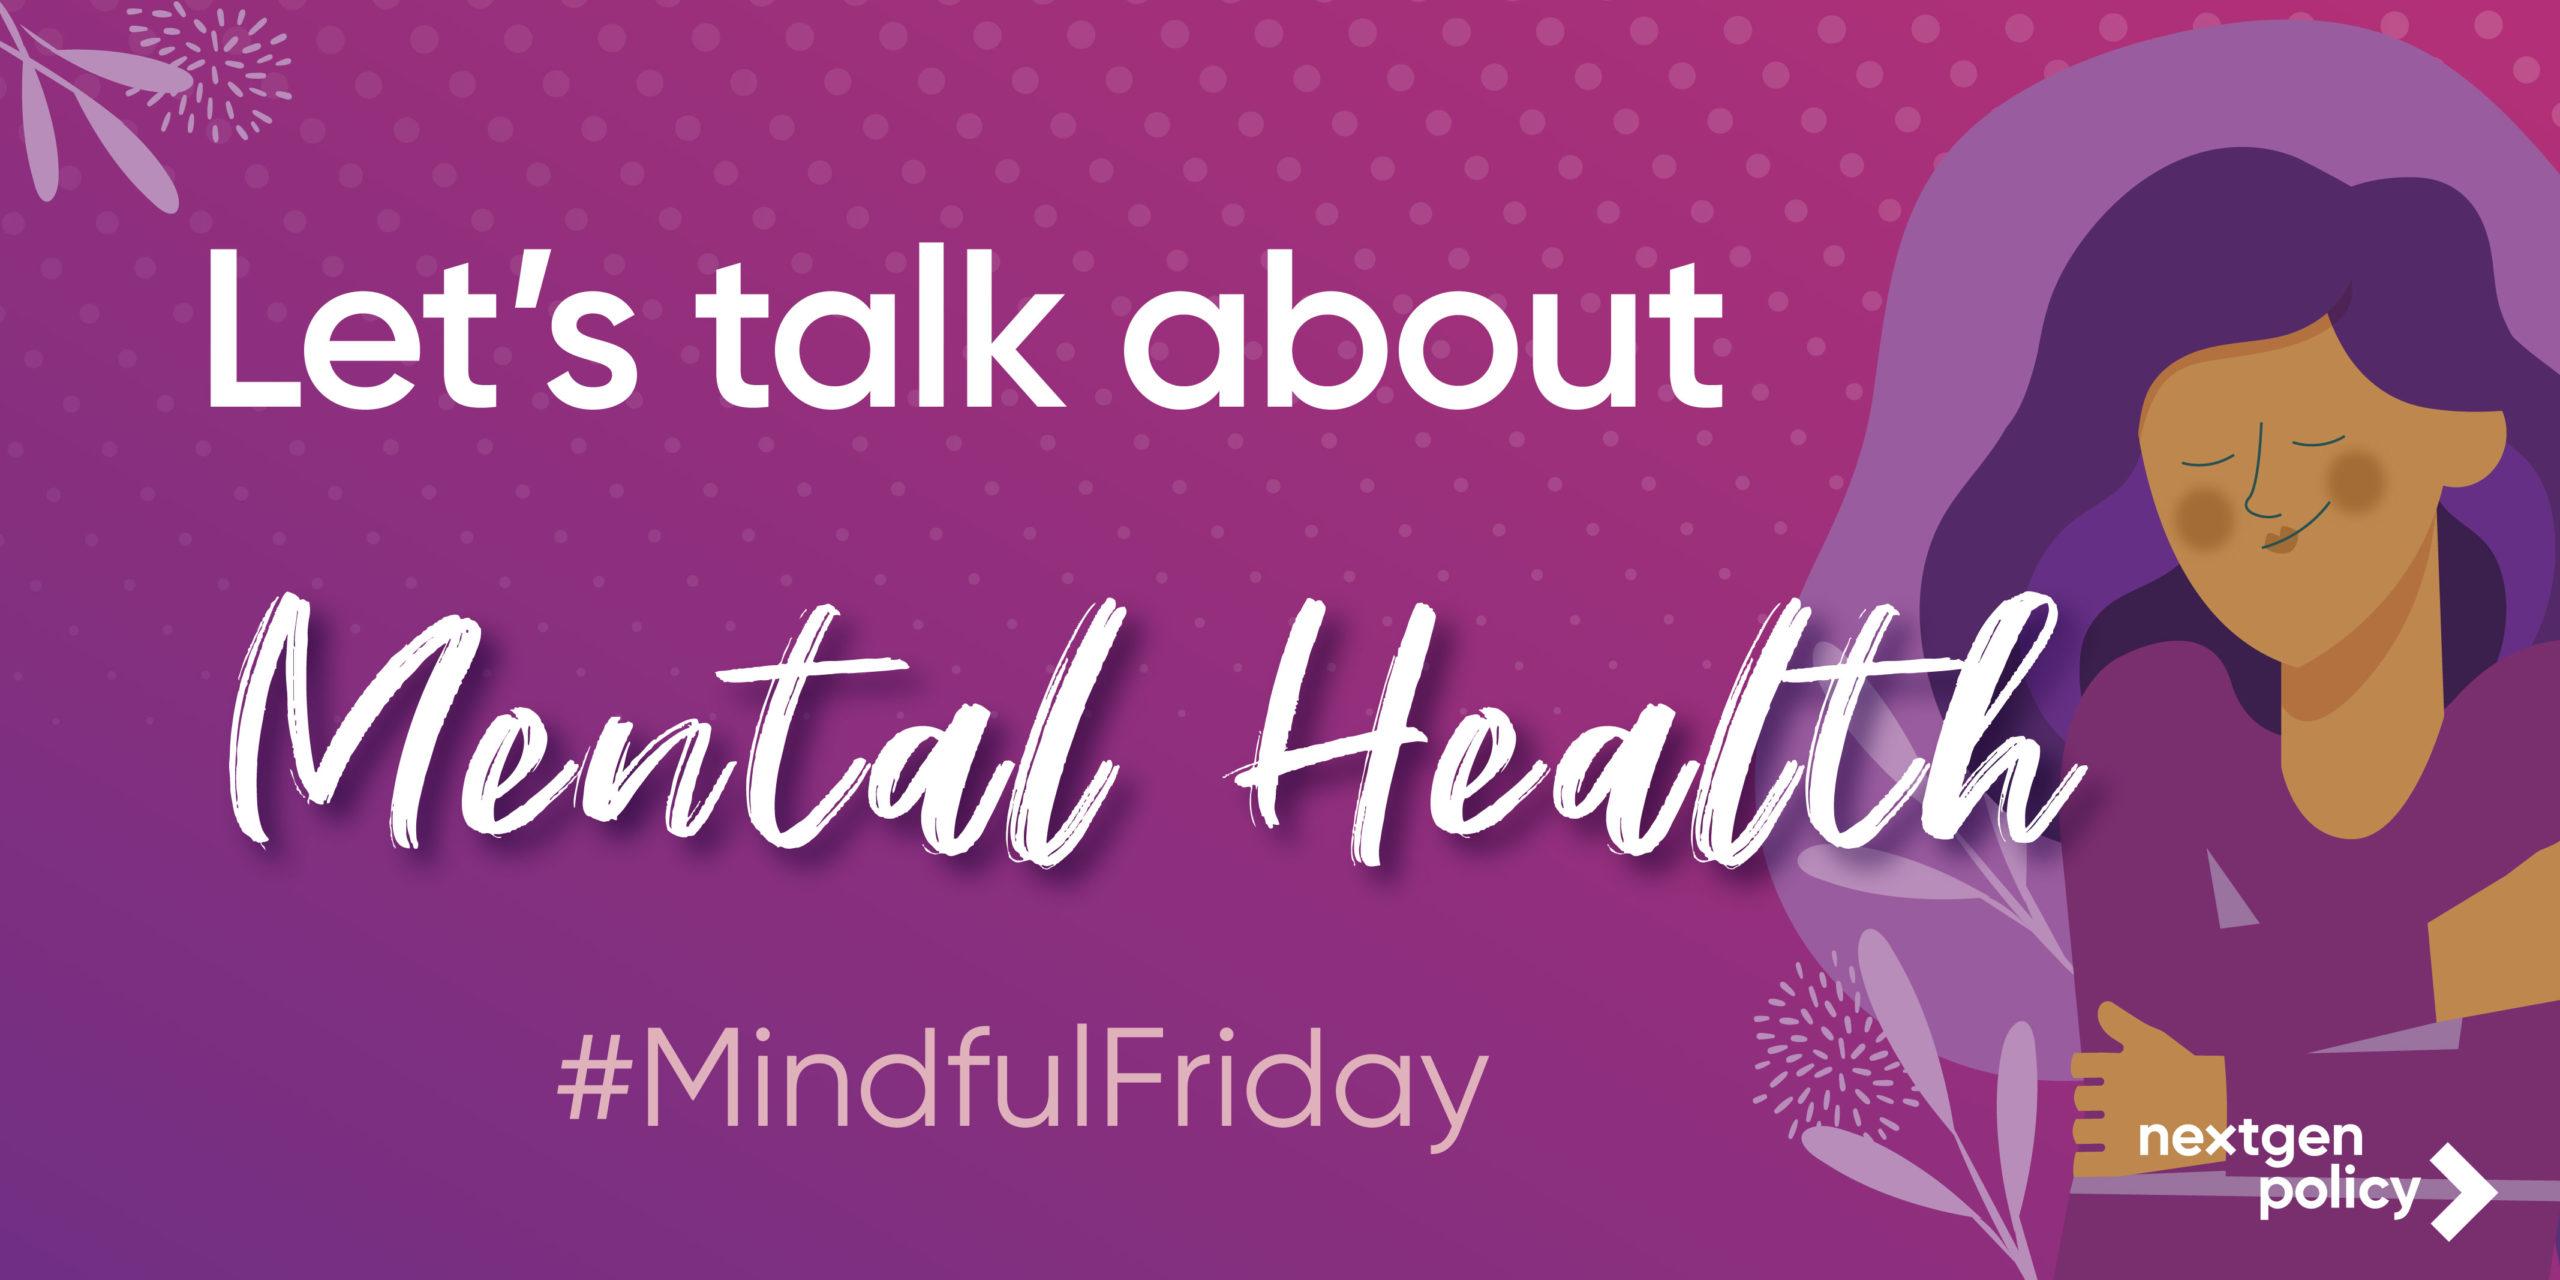 #MindfulFriday Let's talk about mental health